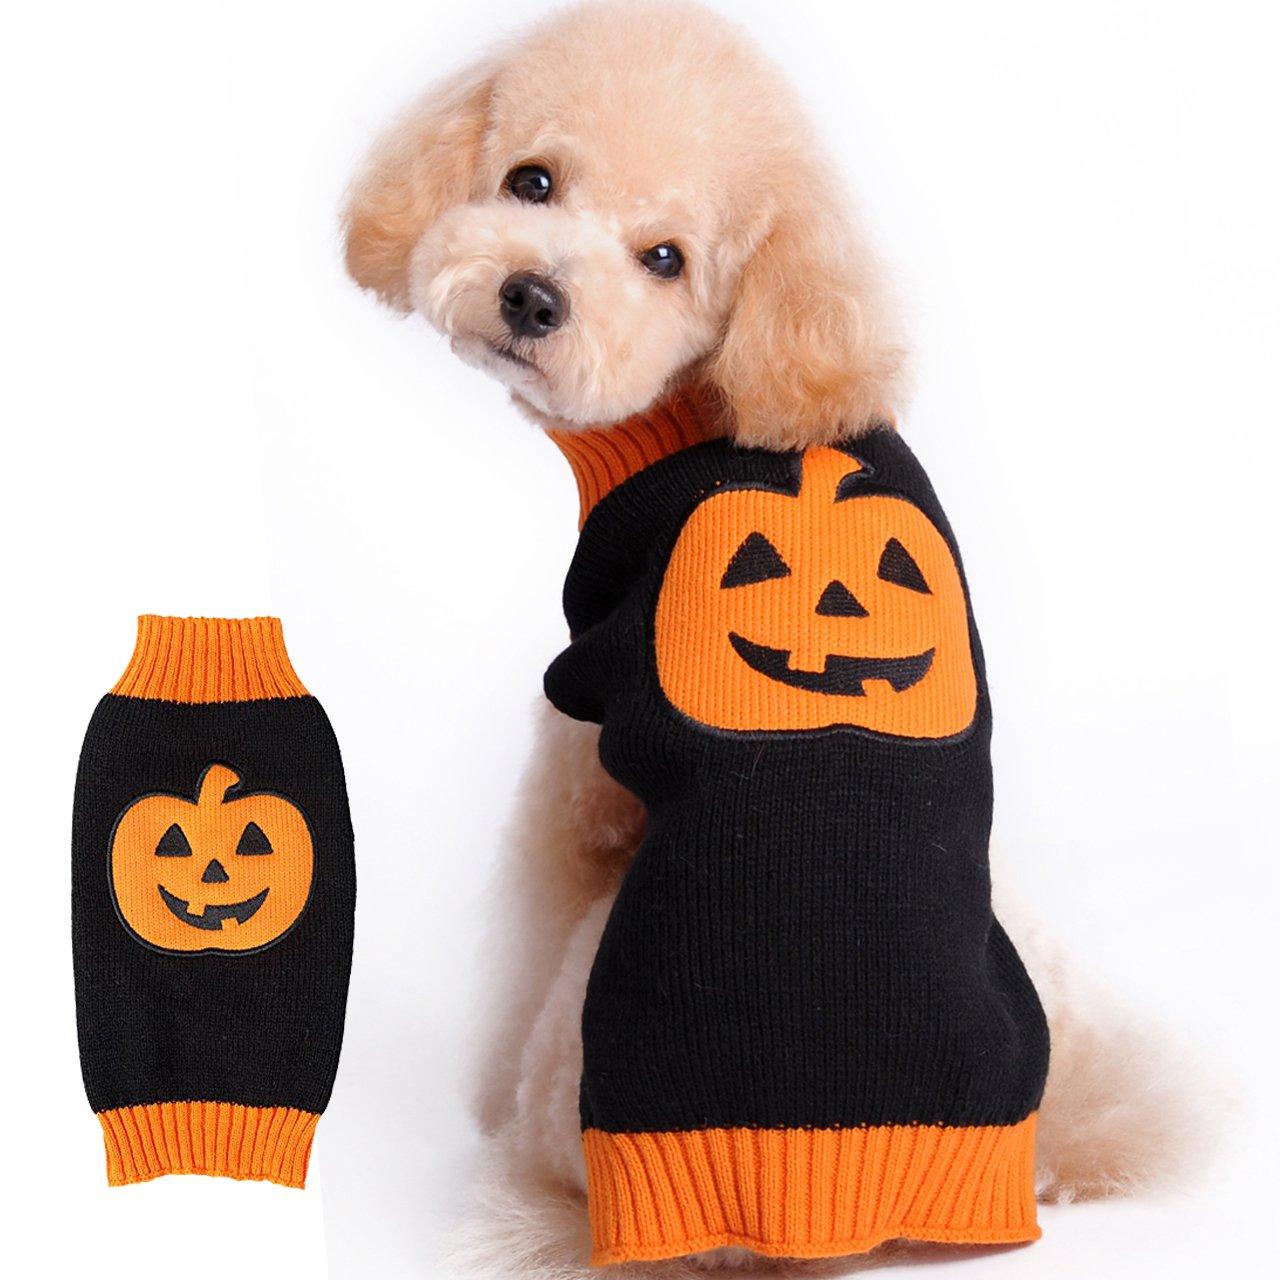 HAPEE Pet Holiday Pumpkin Dog Sweater,Halloween pet Clothes